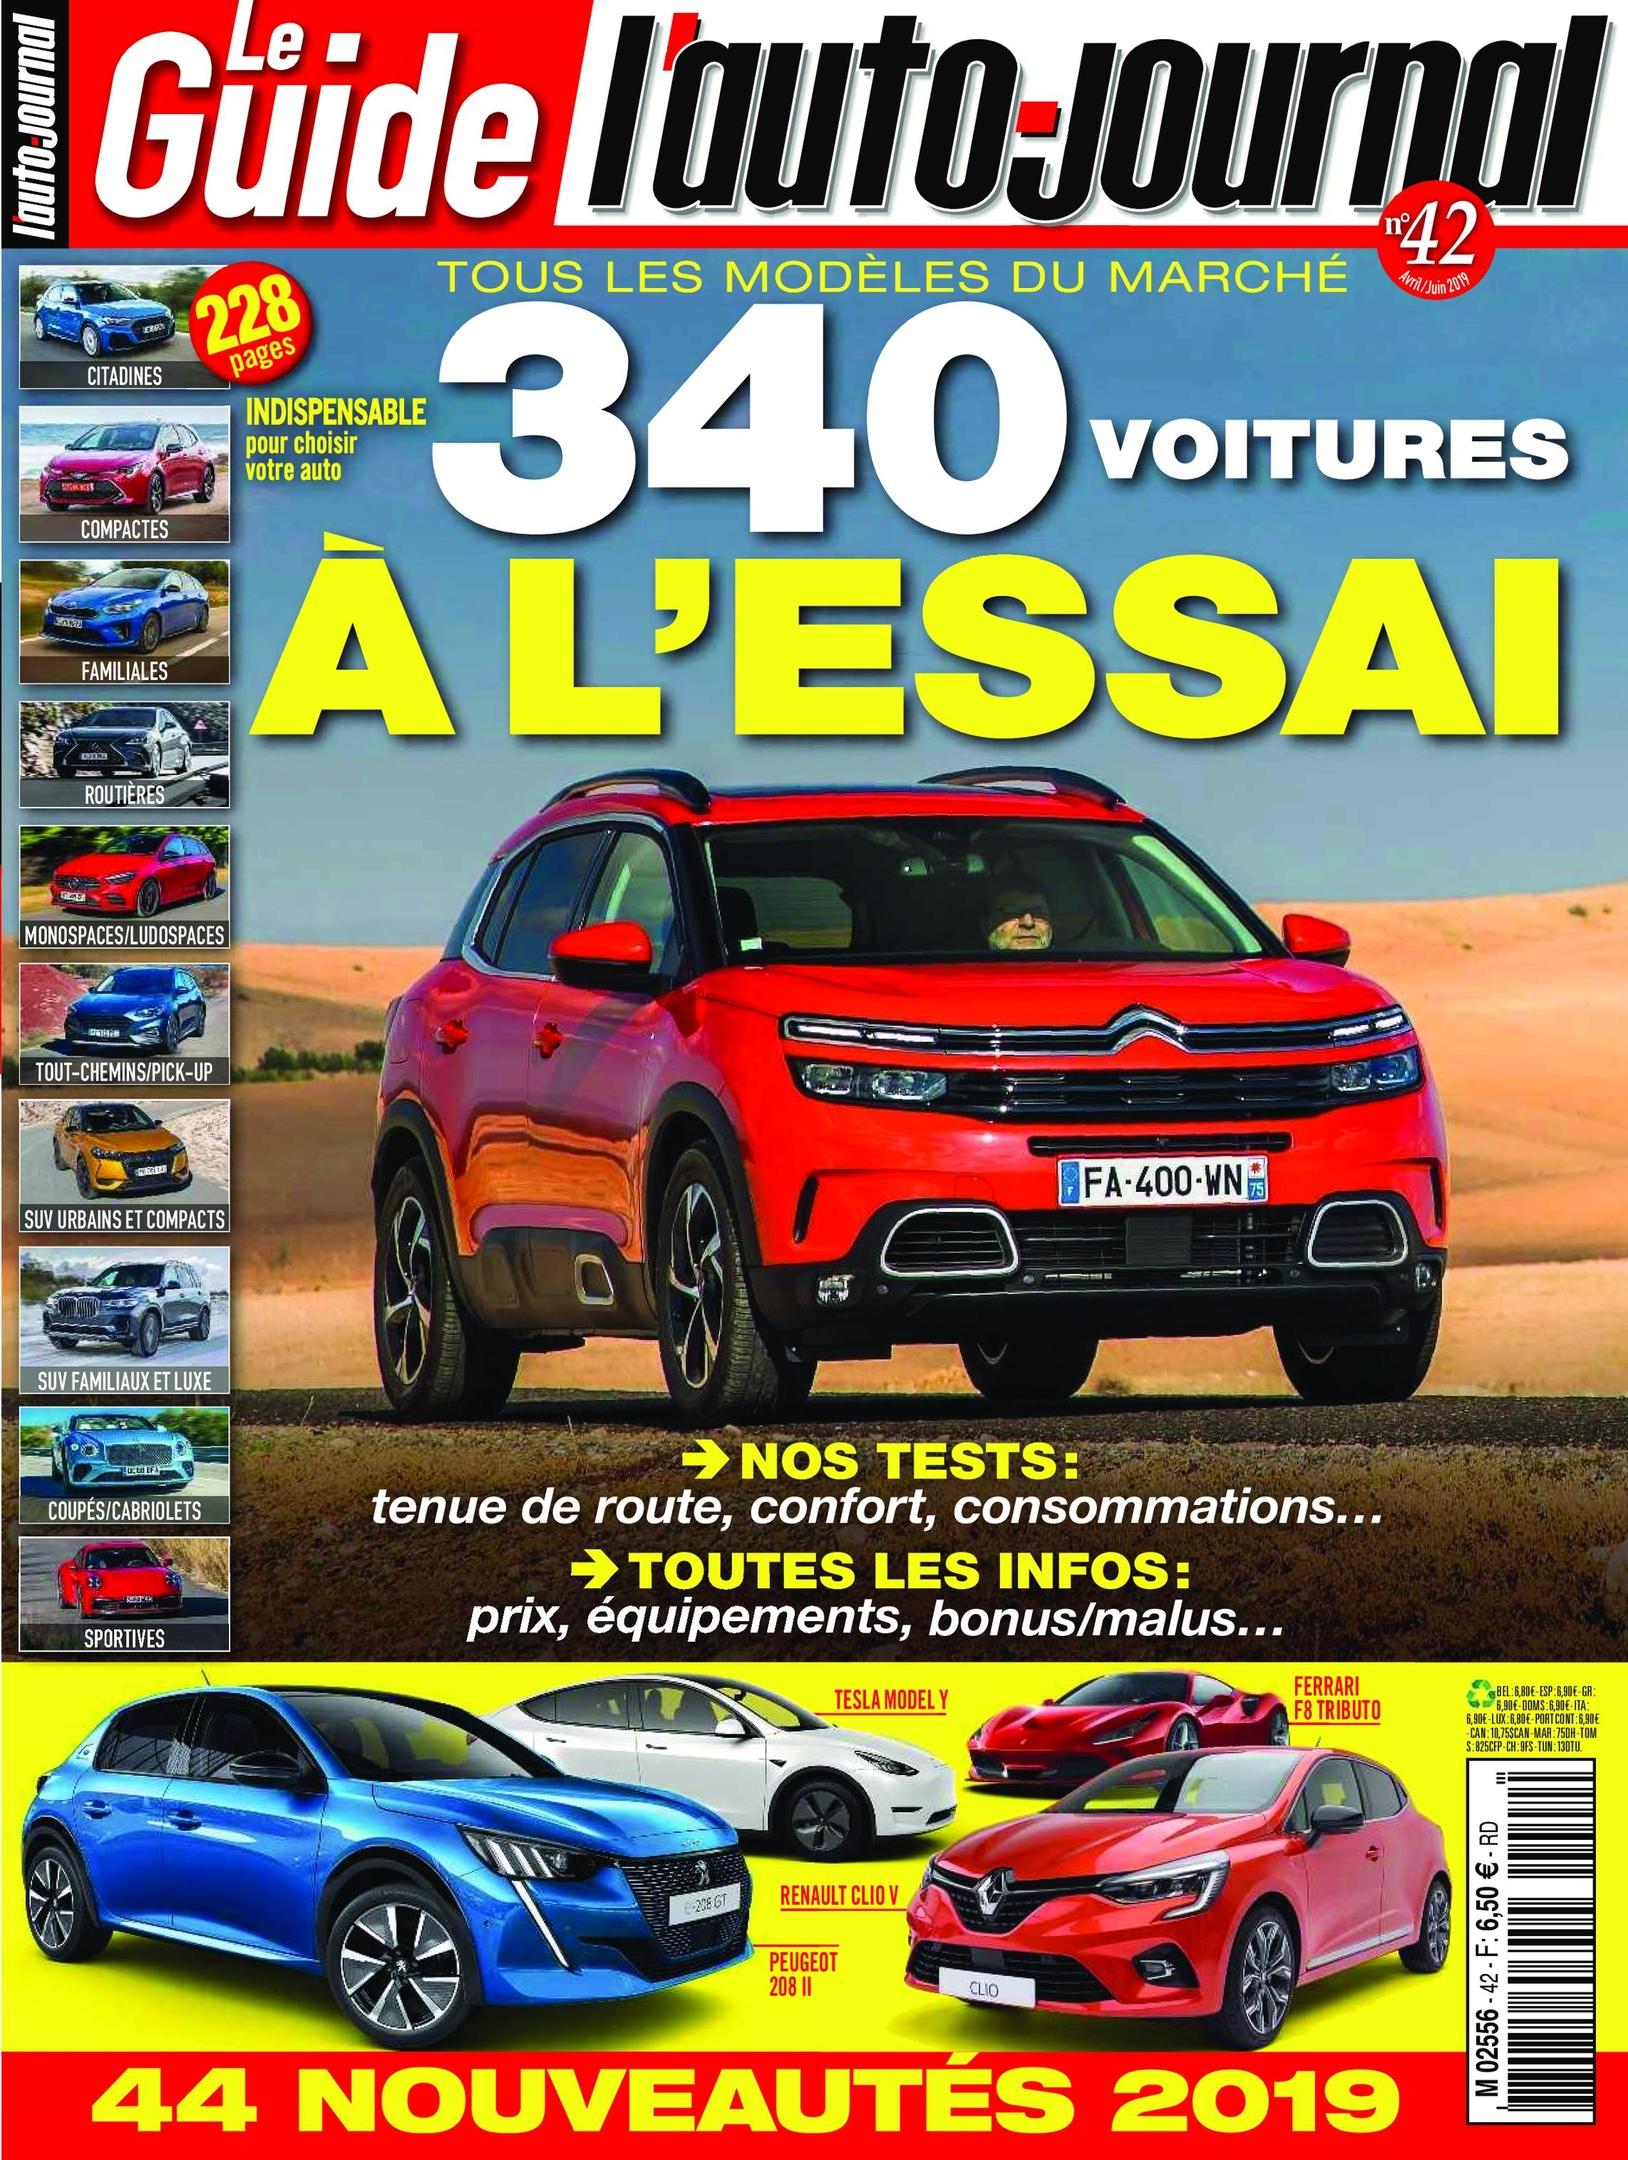 L'Auto-Journal (Le Guide) – Avril 2019